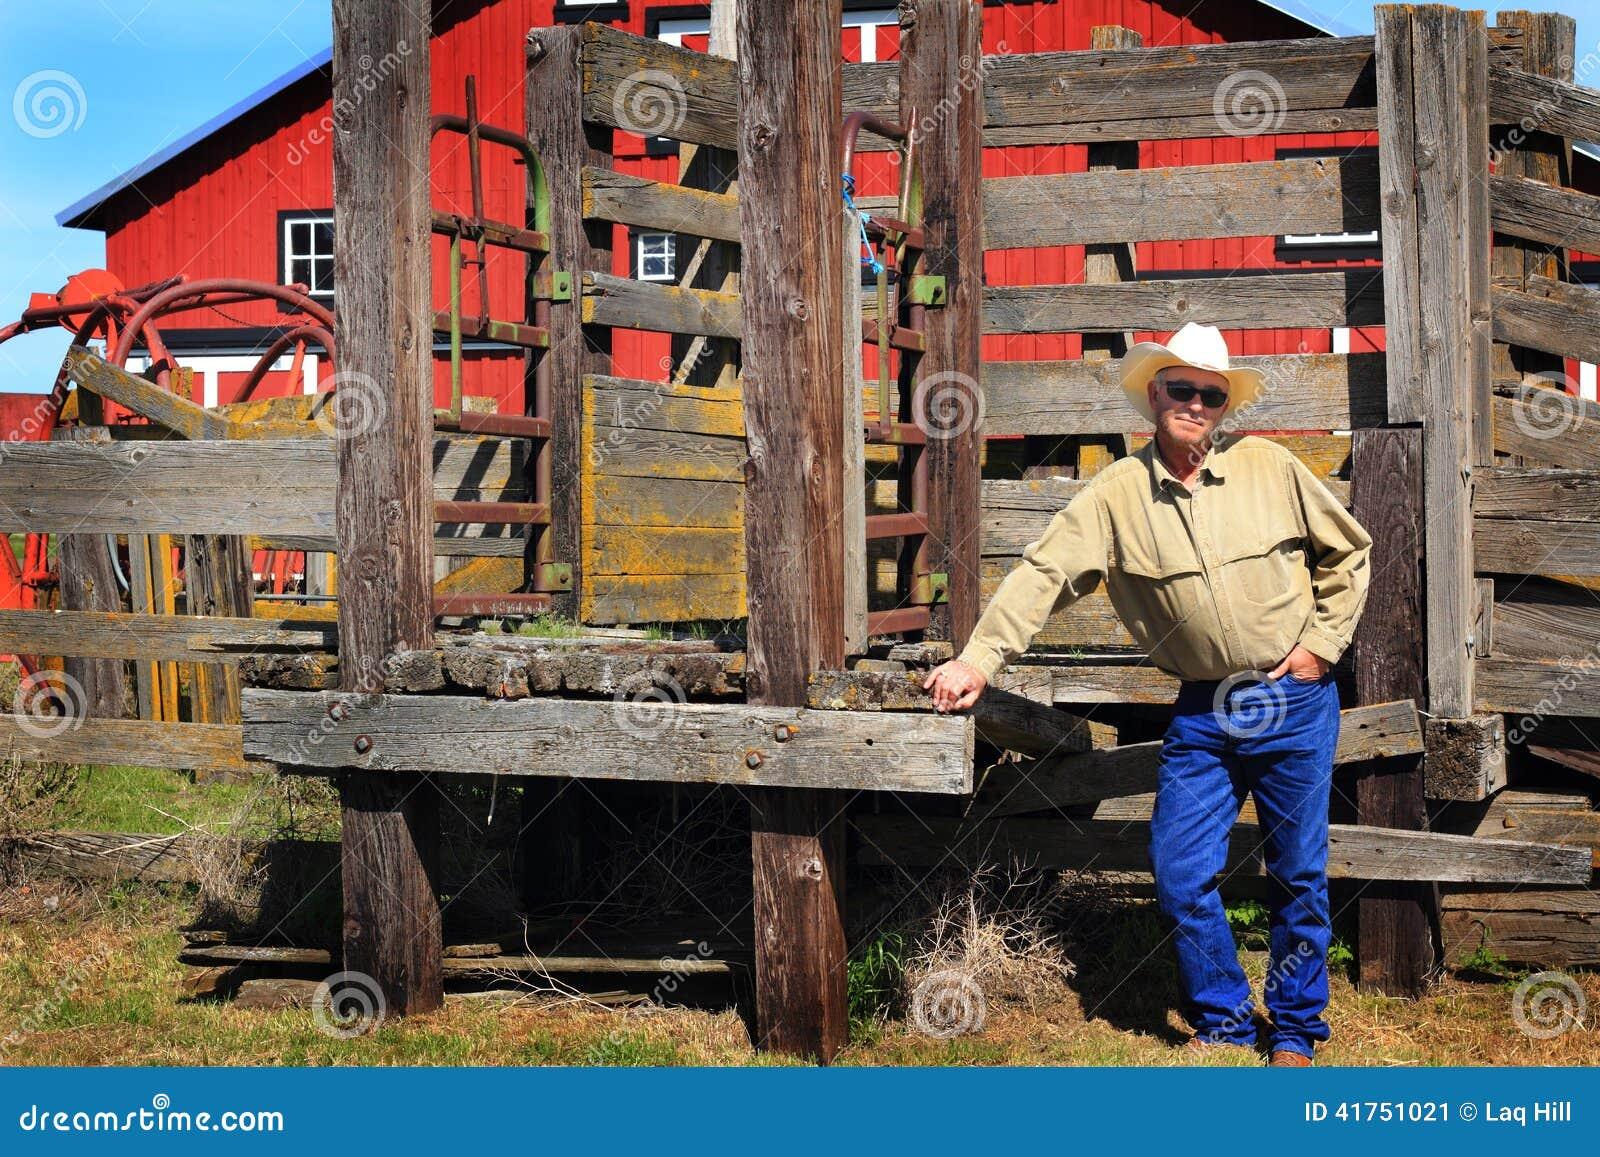 Ranchero Moderno Tarjetas Archivo Sin Afeitar De Imagen wO08knP